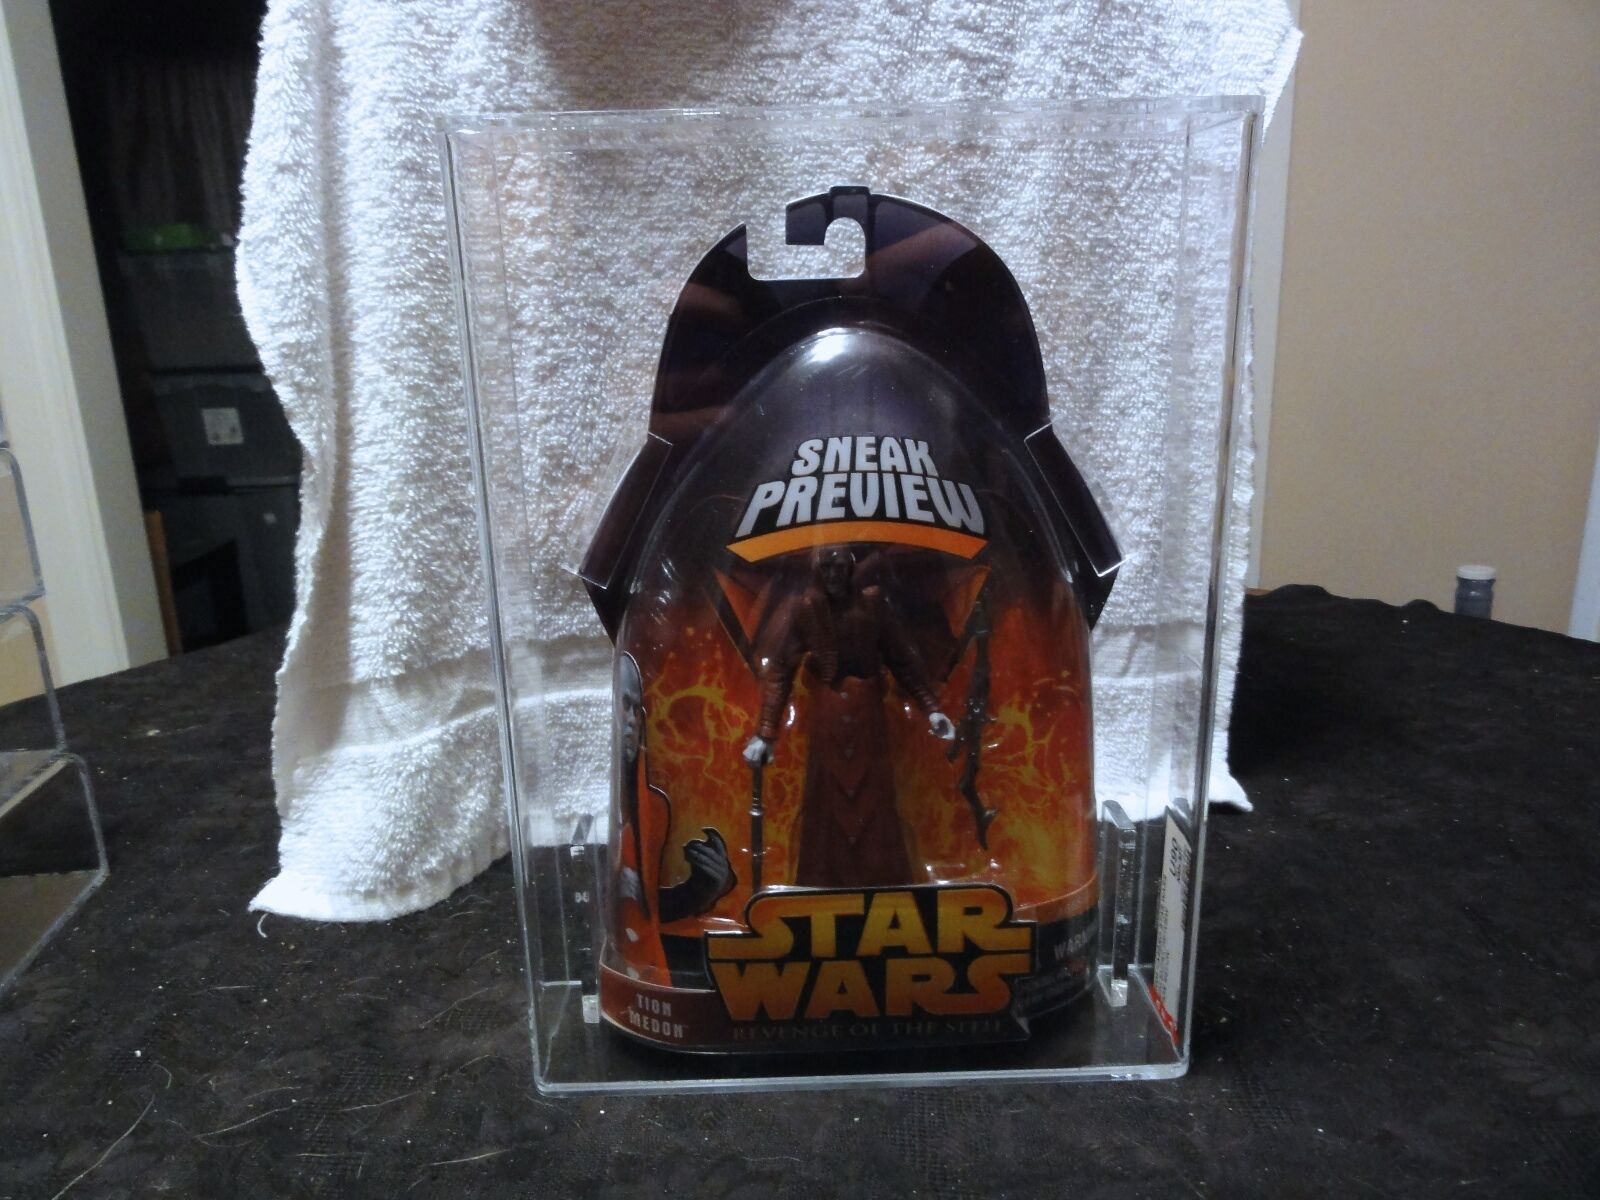 Star Wars 2005 ROTS Sneak Preview Tion Medon AFA Sealed MIB BOX